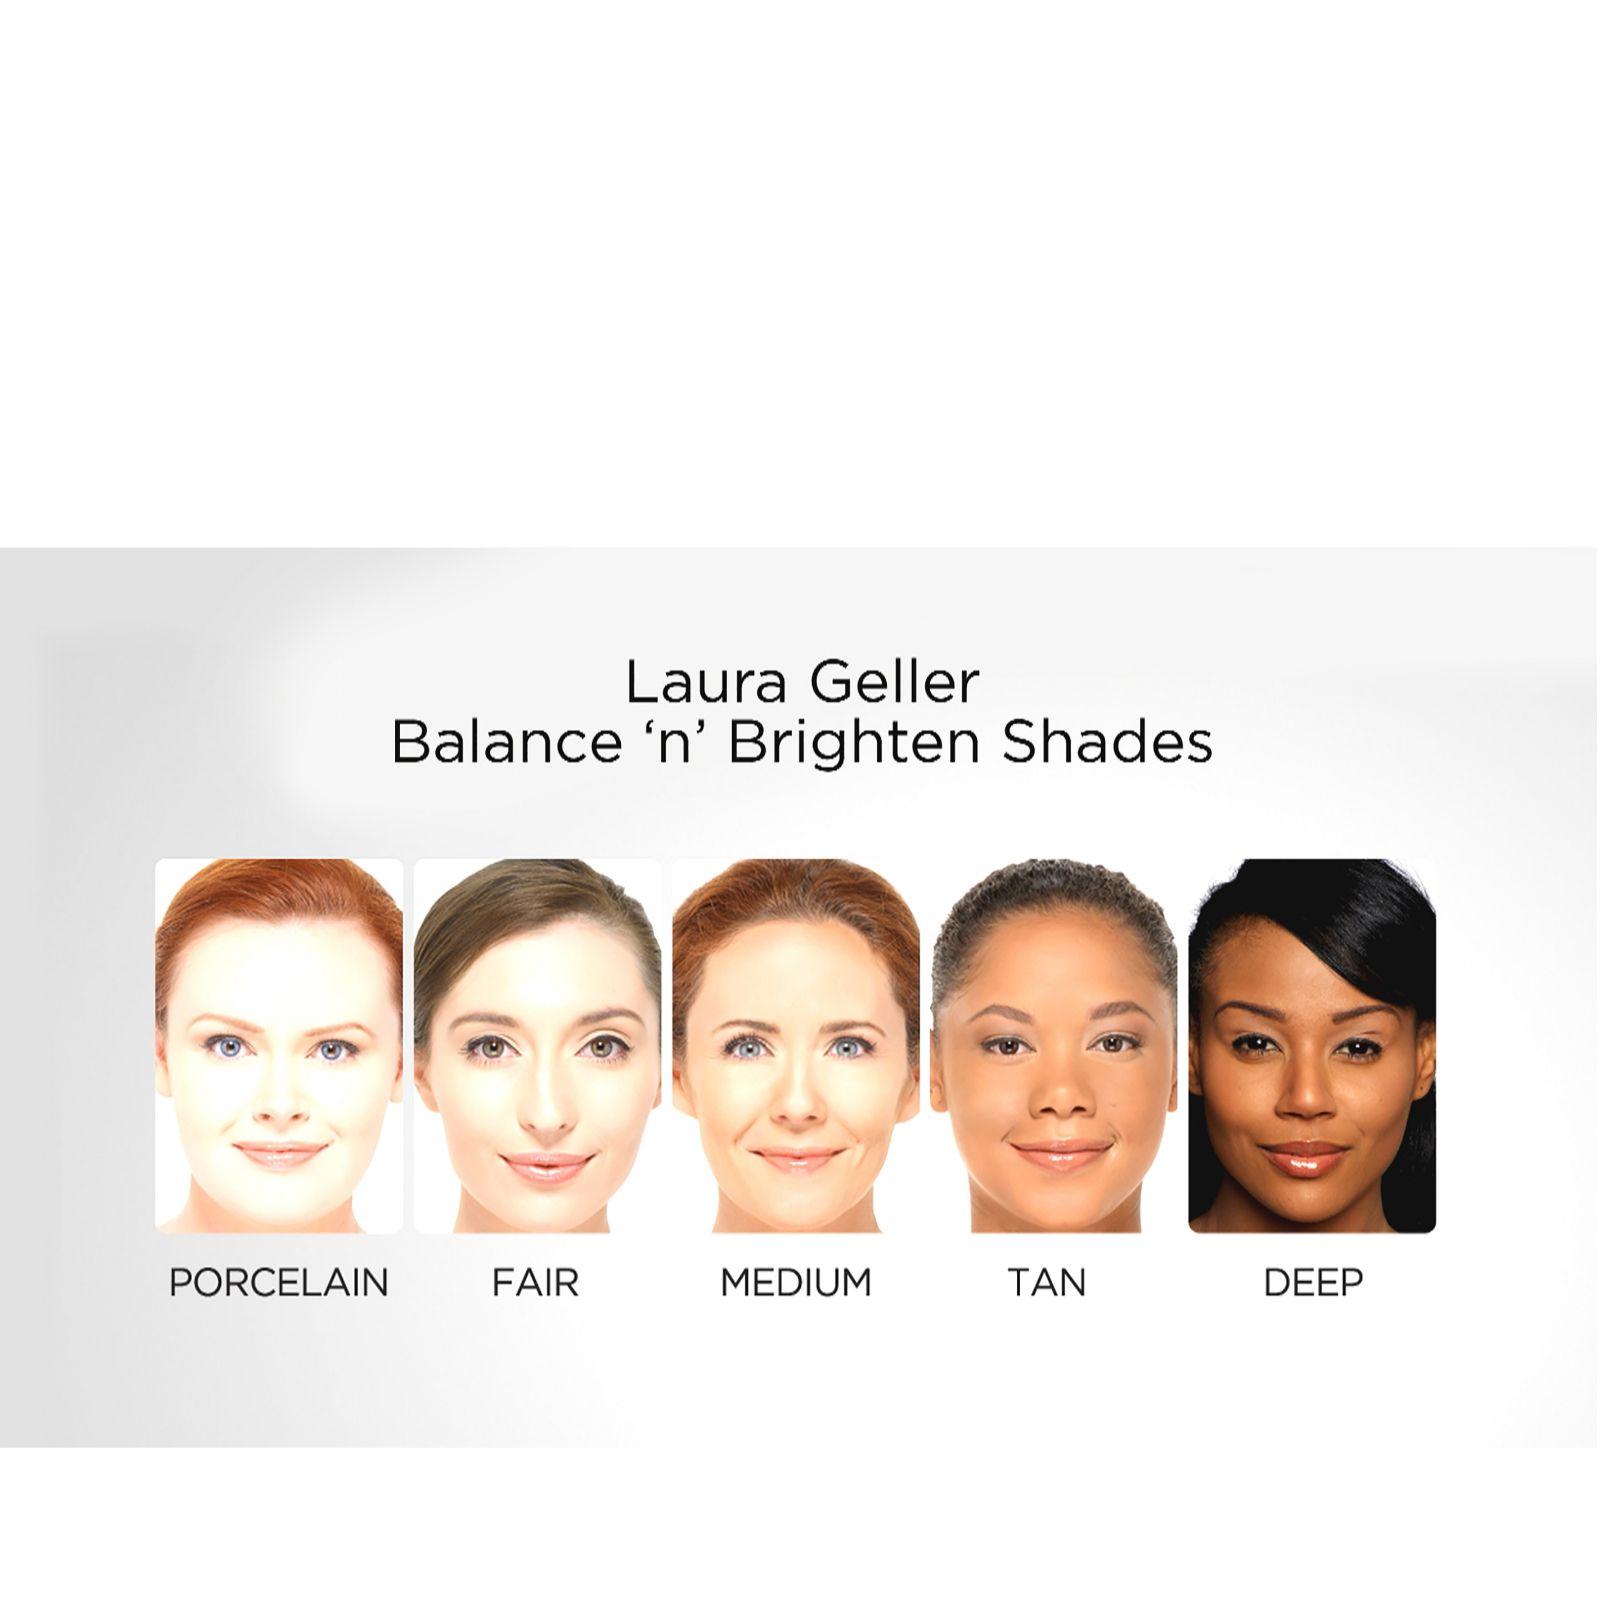 Laura Geller Balance-n-Brighten Baked Foundation 9g & Brush - QVC UK